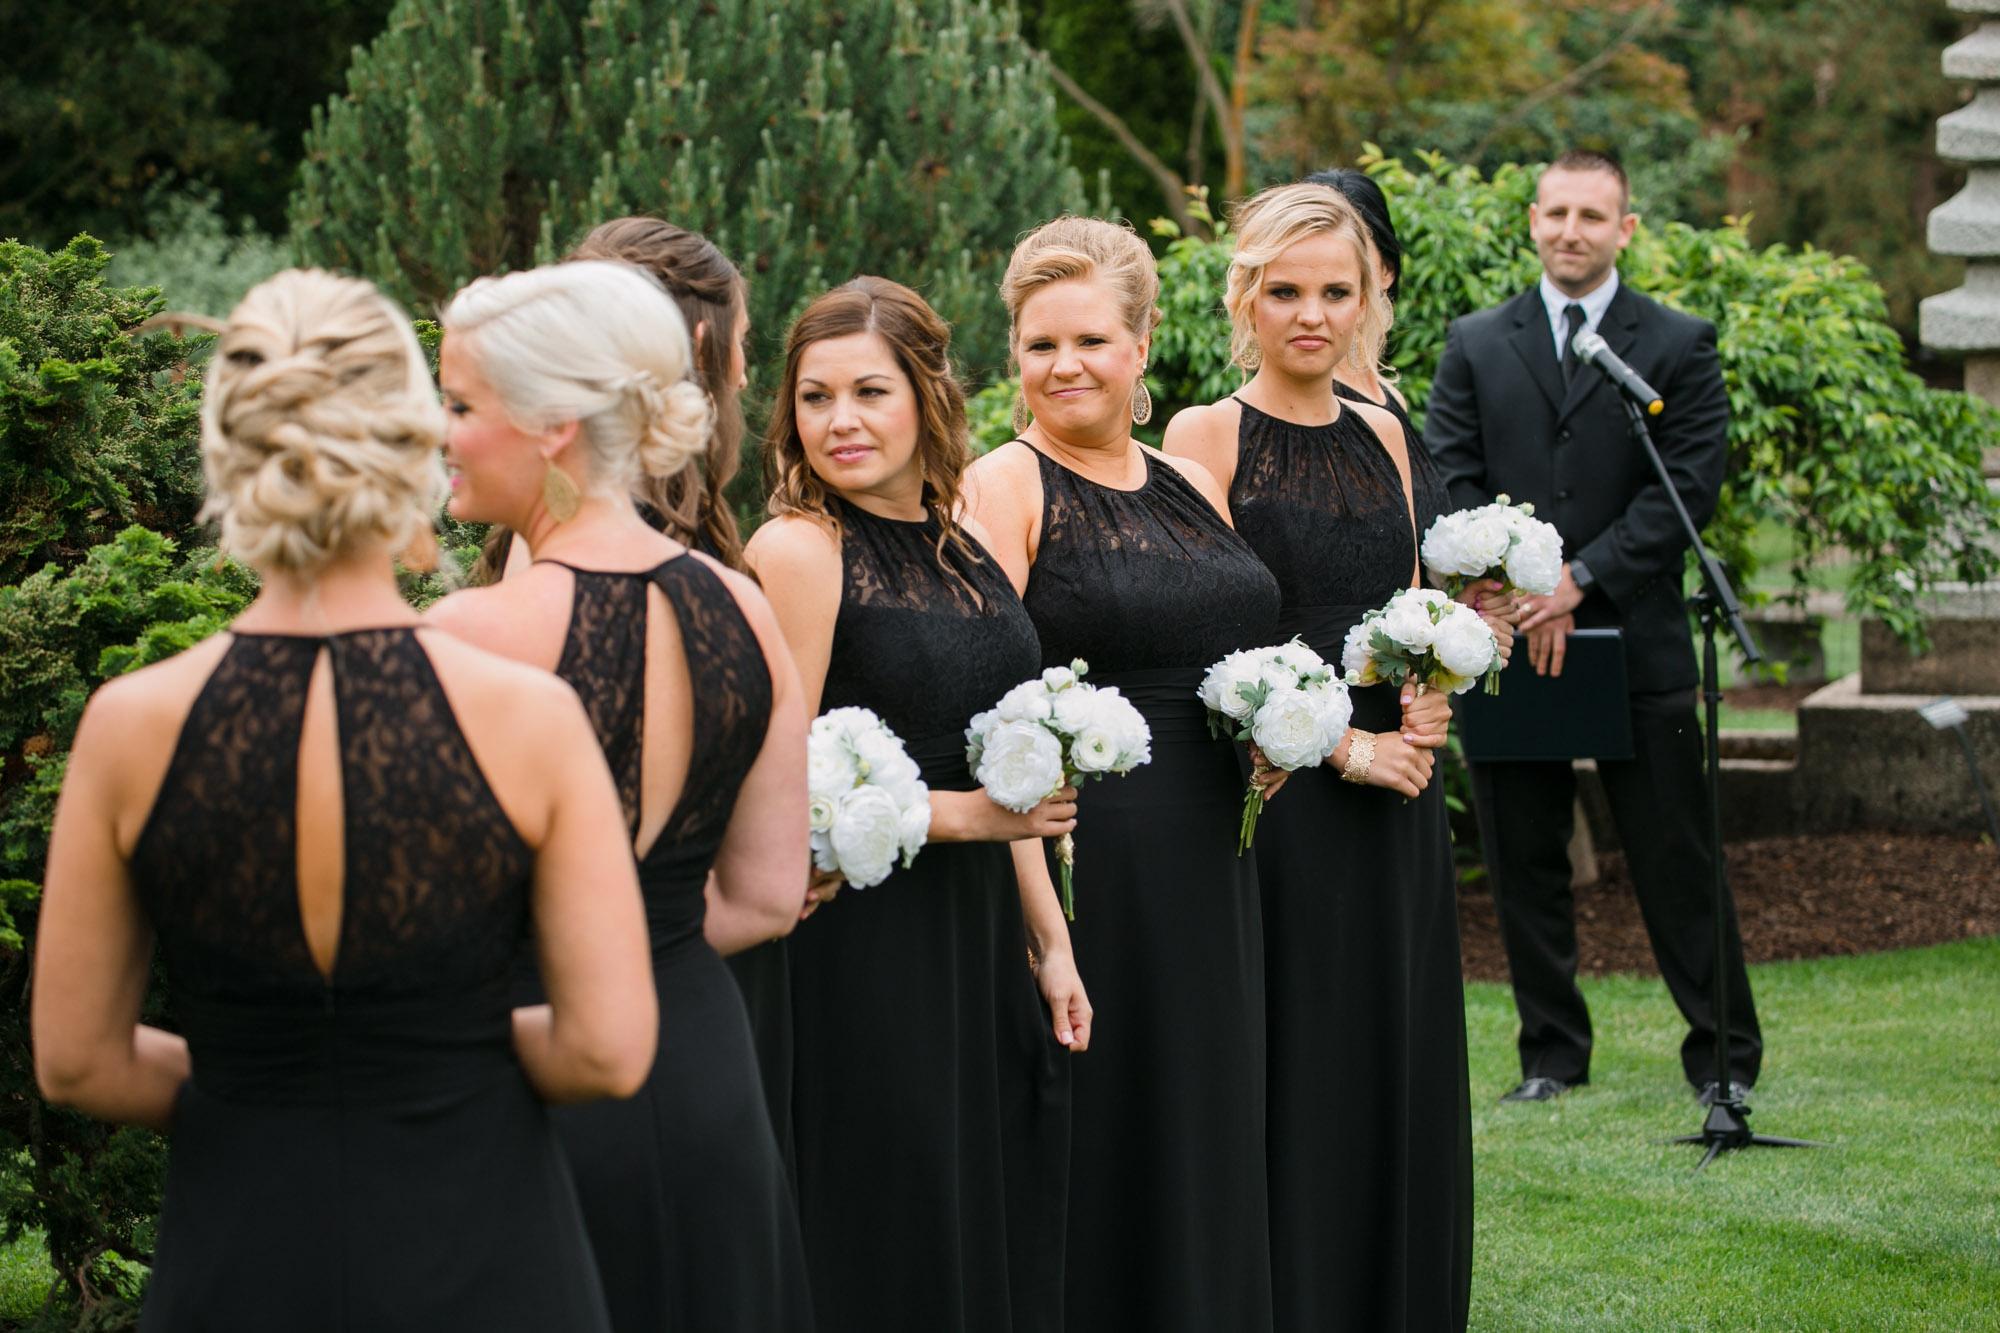 hensville-wedding-downtown-toledo-ohio (35 of 103).jpg